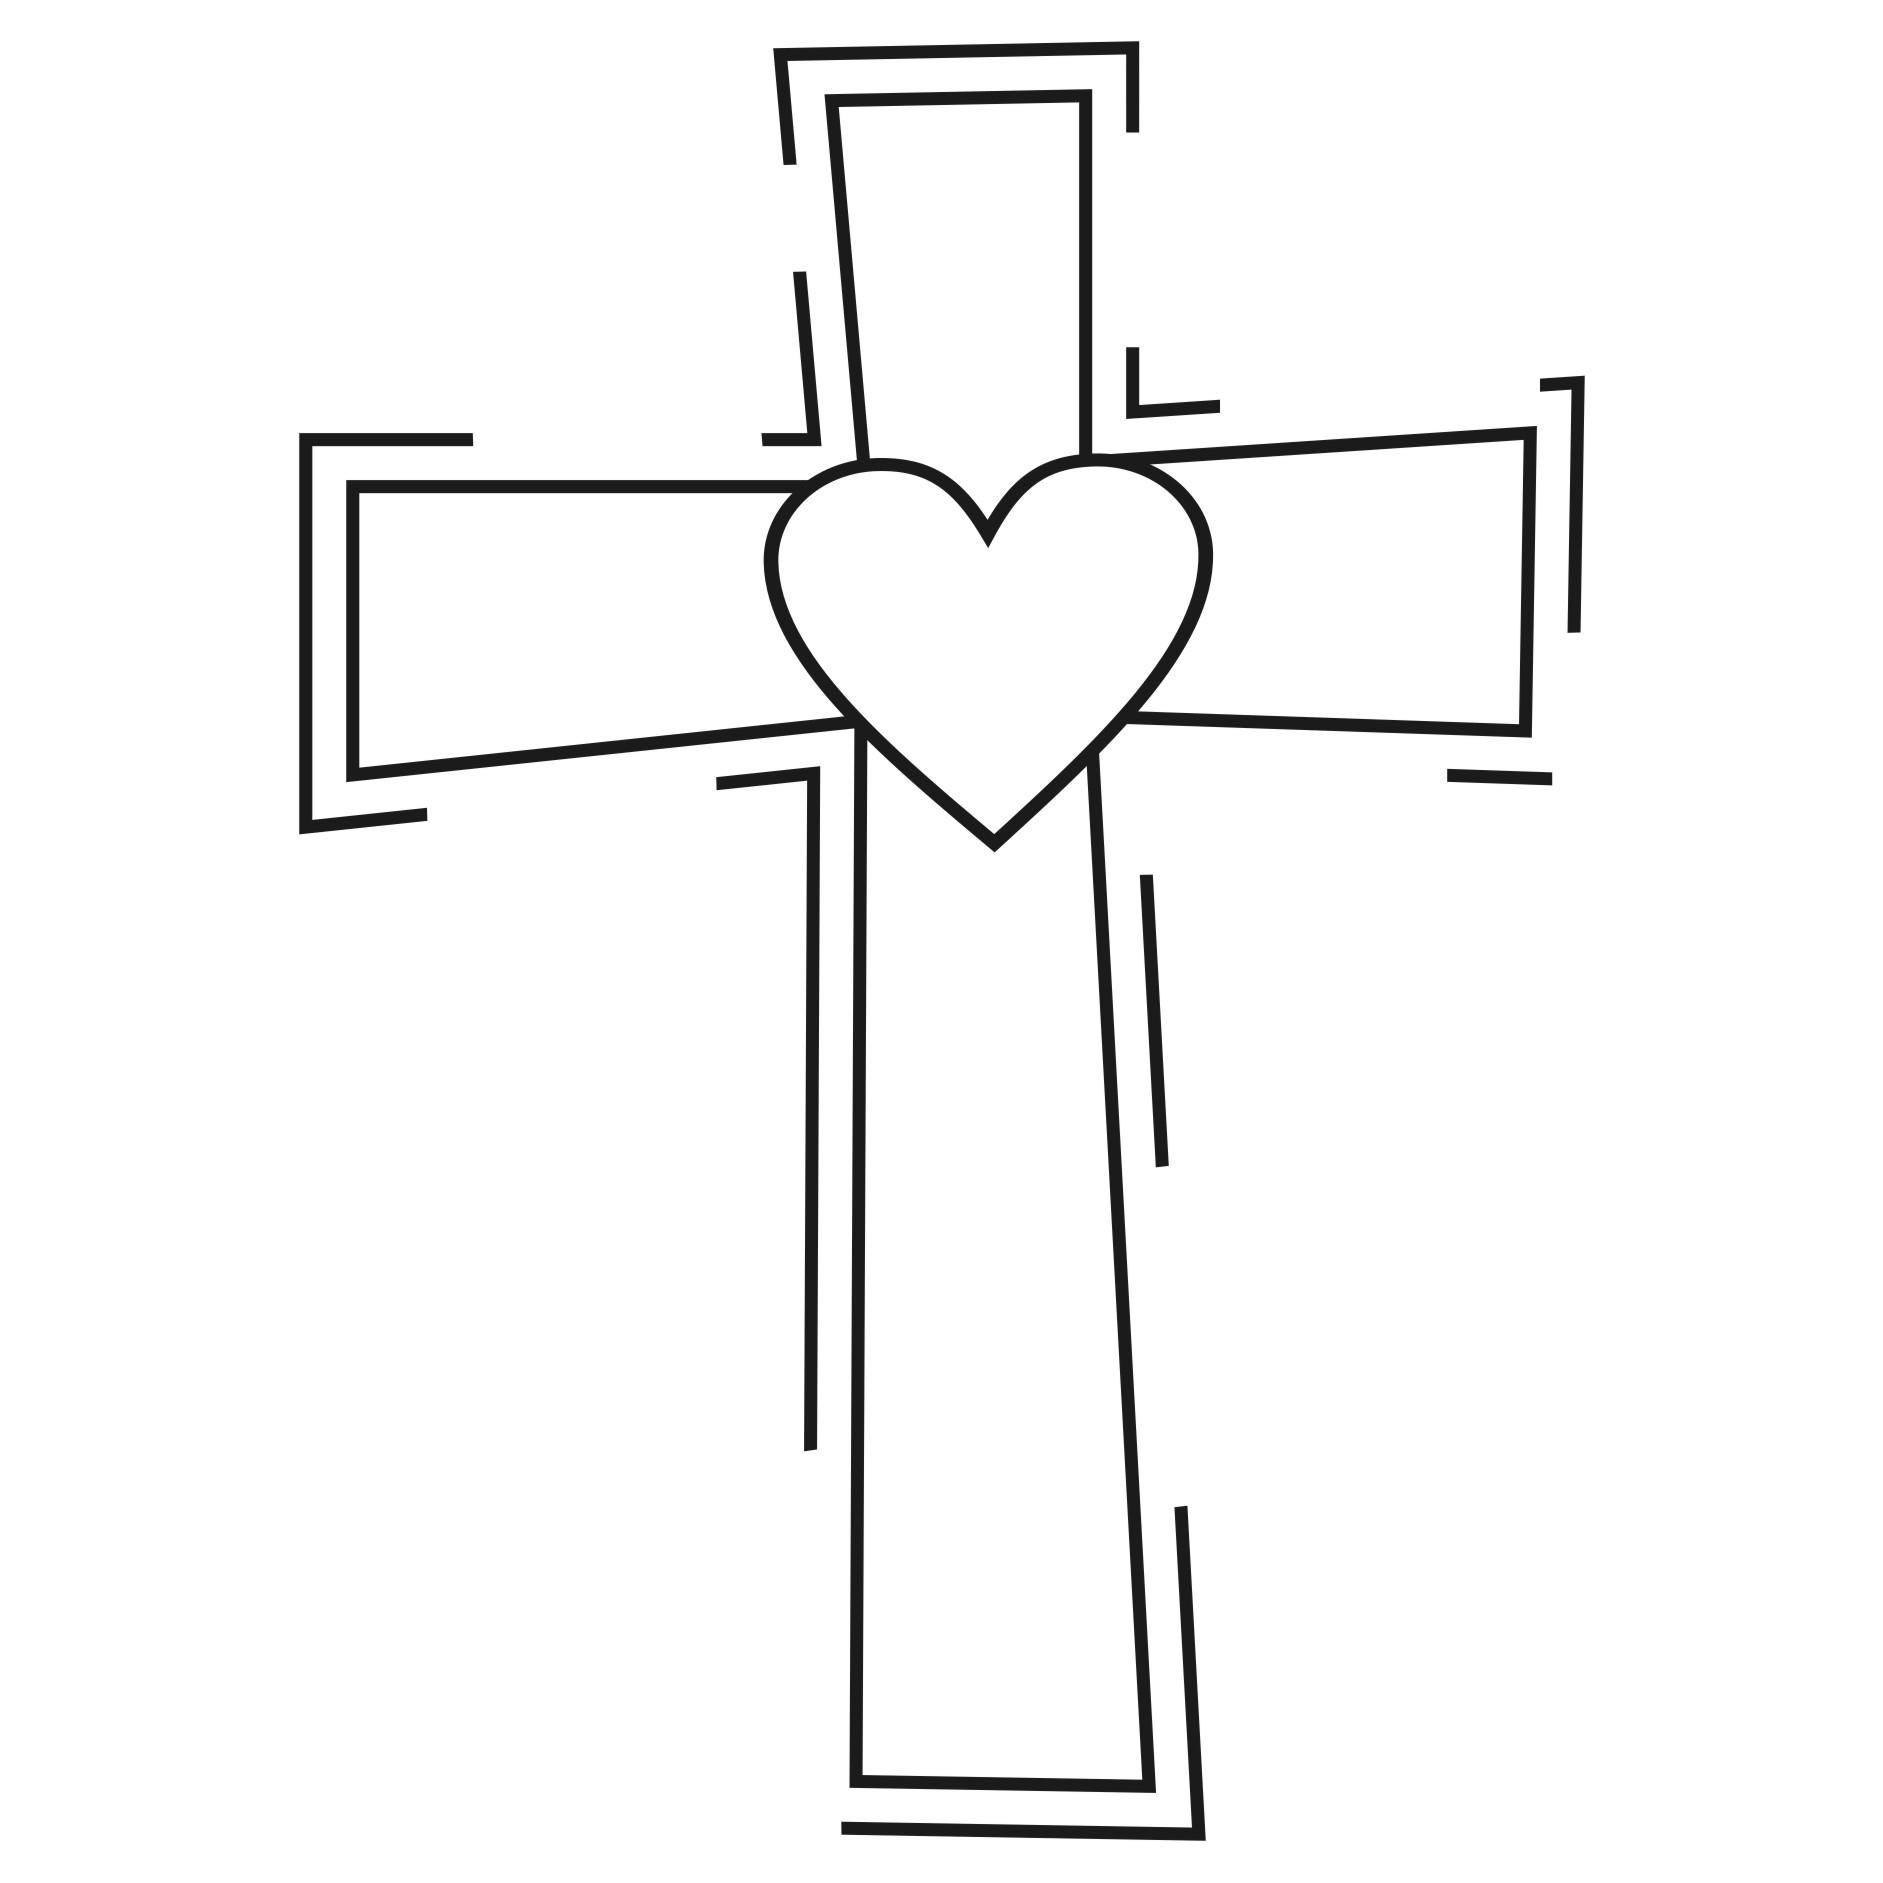 clipart cross | r 53-clipart cross | r 53-7